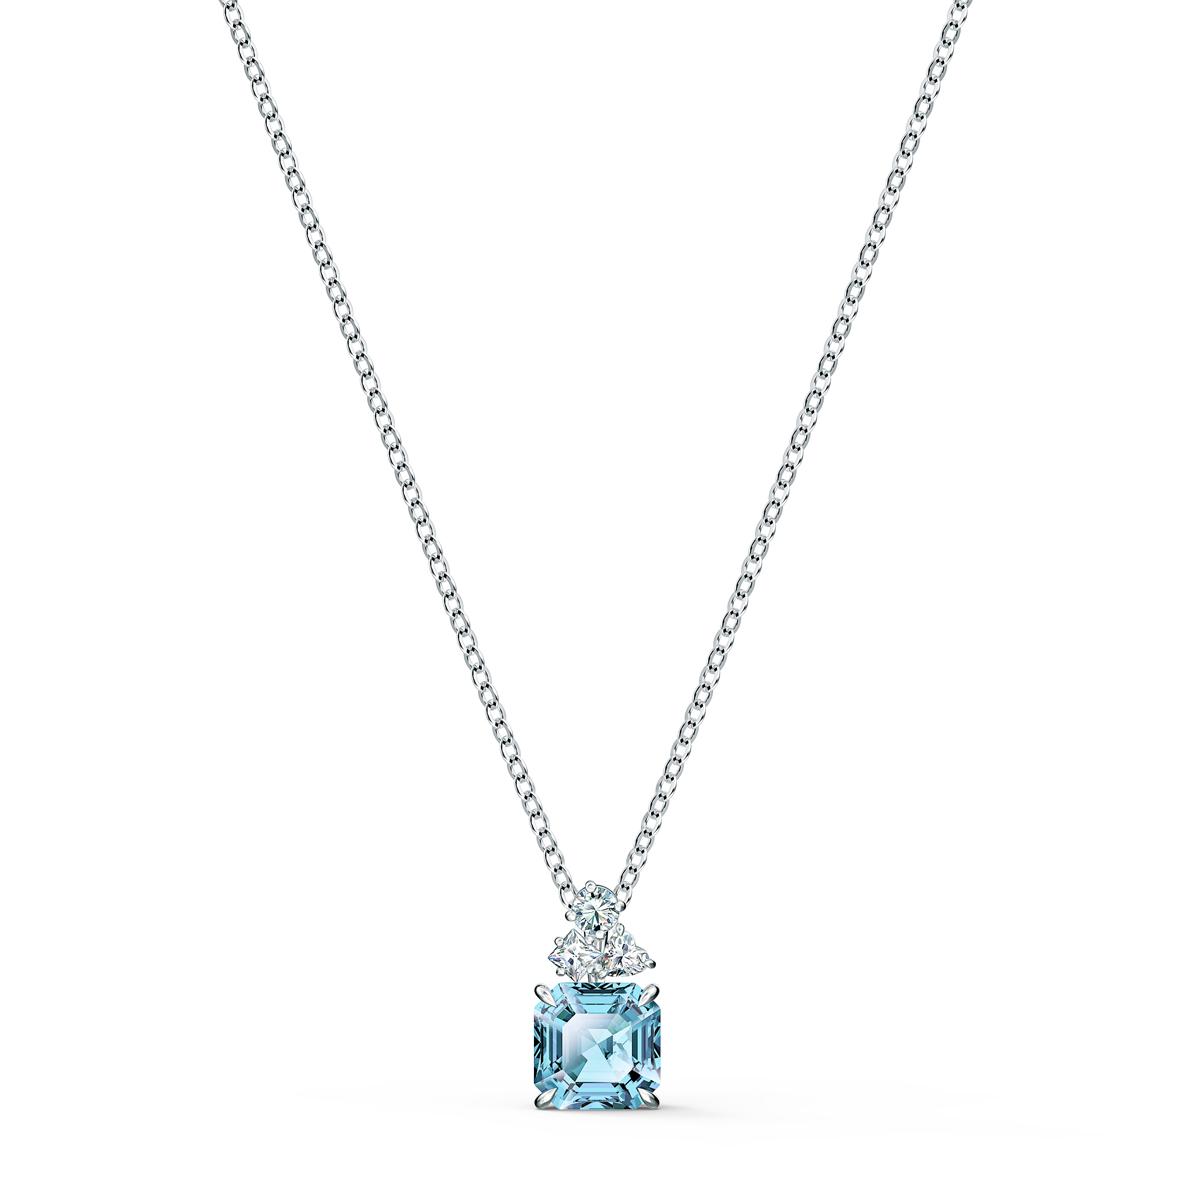 Swarovski Necklace Sparkling Pendant Square Aqua Rhodium Silver